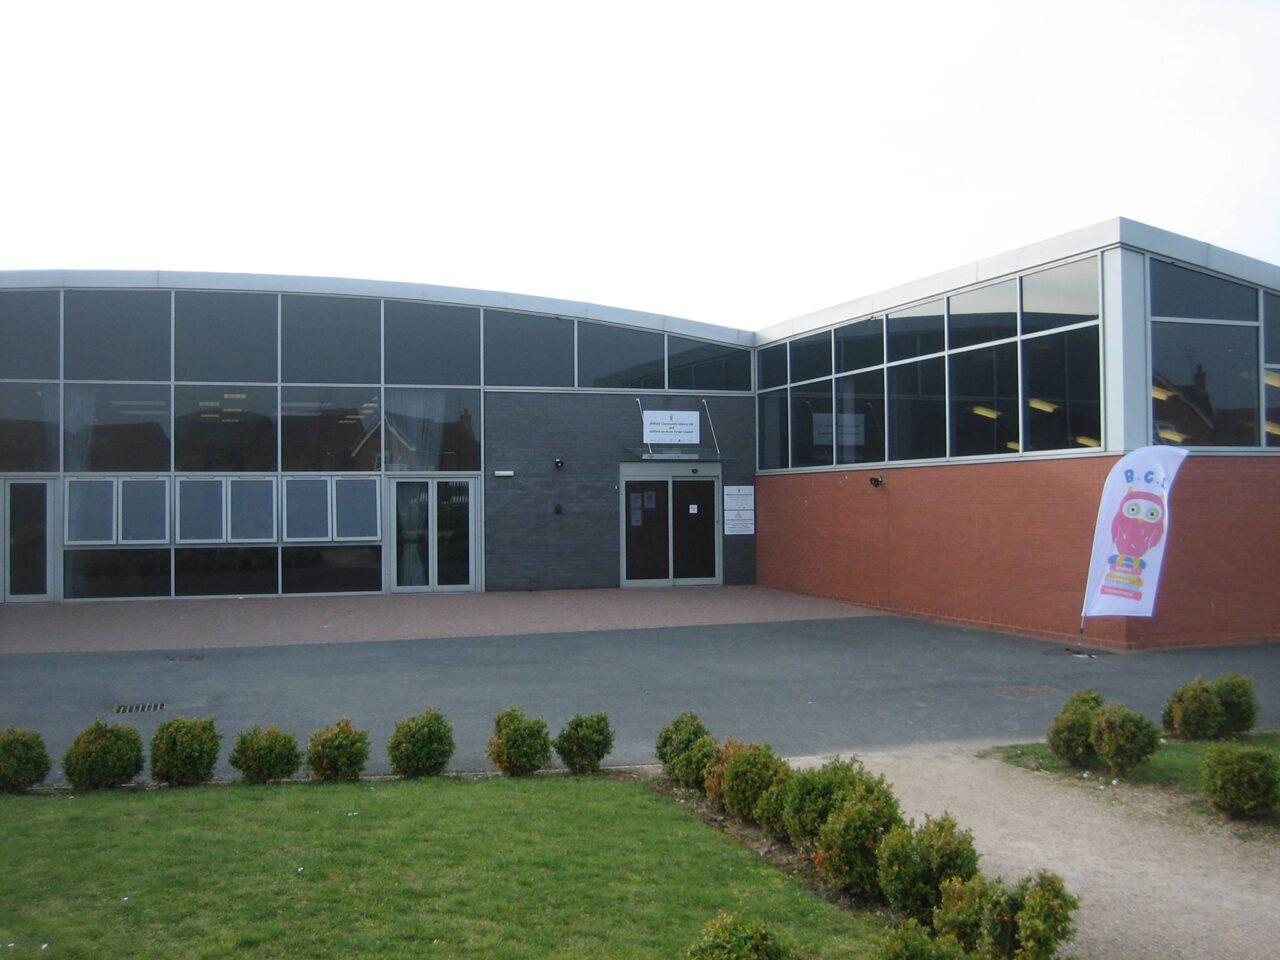 Outside Bidford Community Library